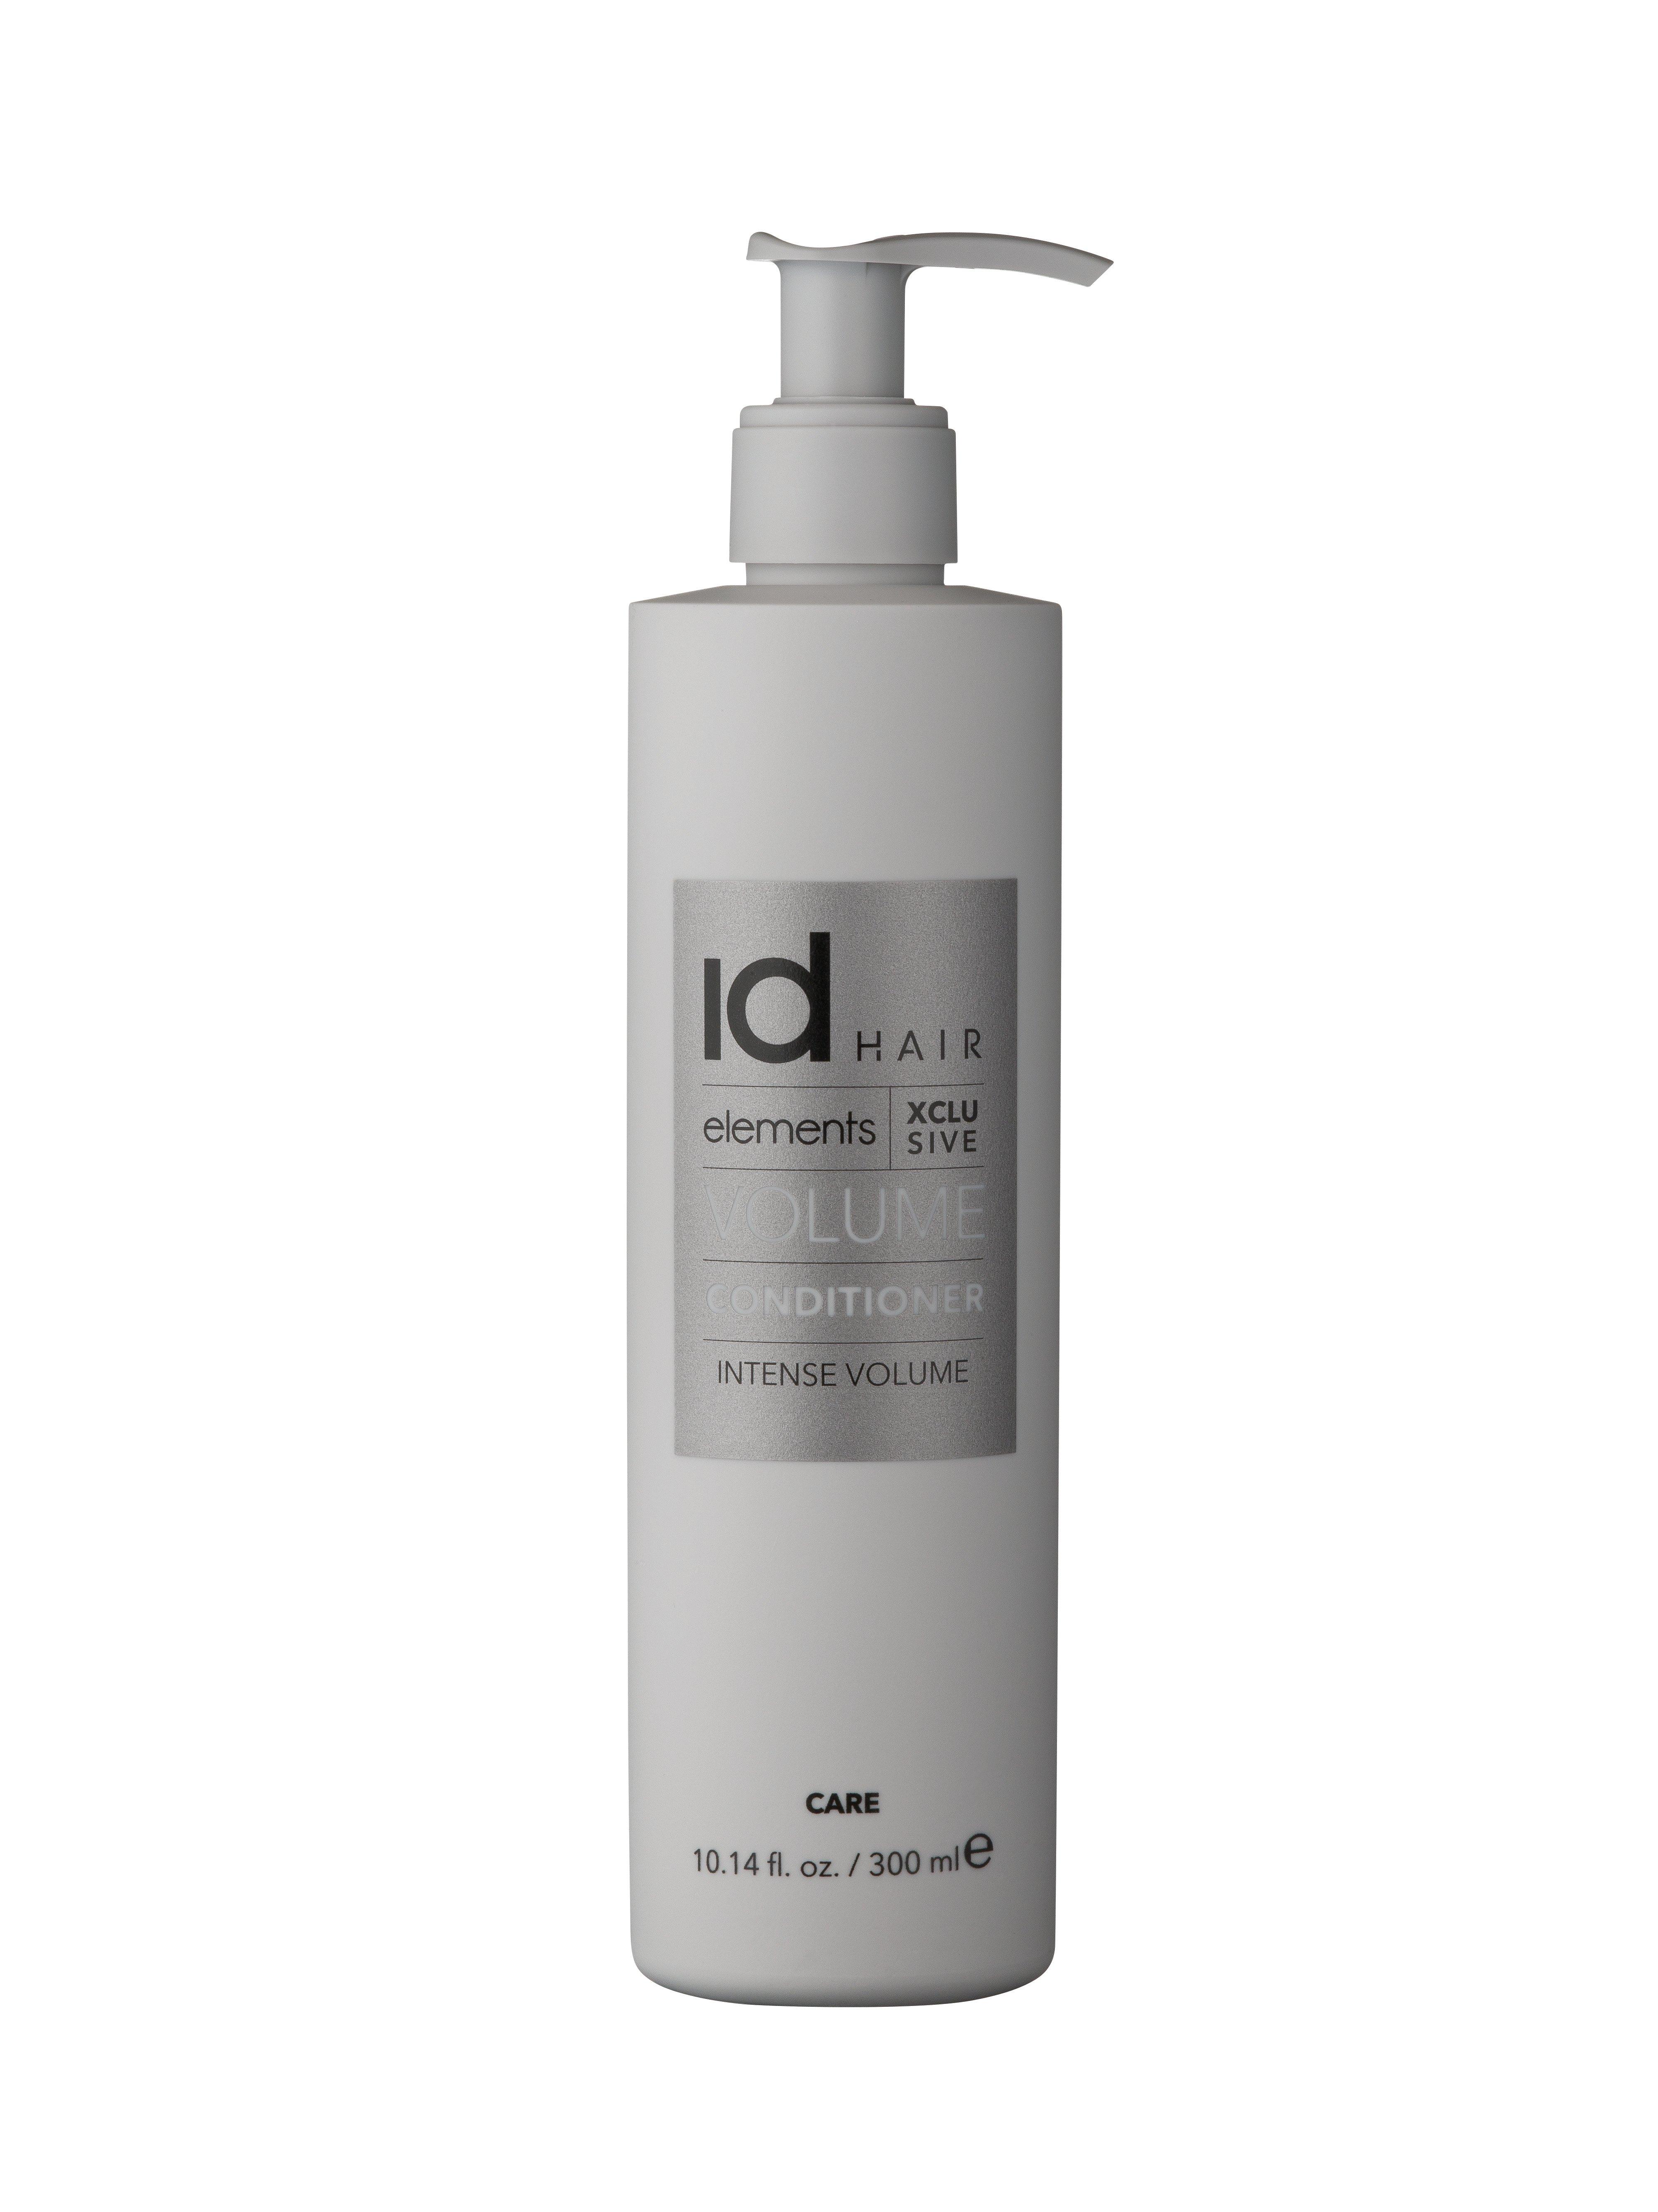 IdHAIR - Elements Xclusive Volume Conditioner 300 ml